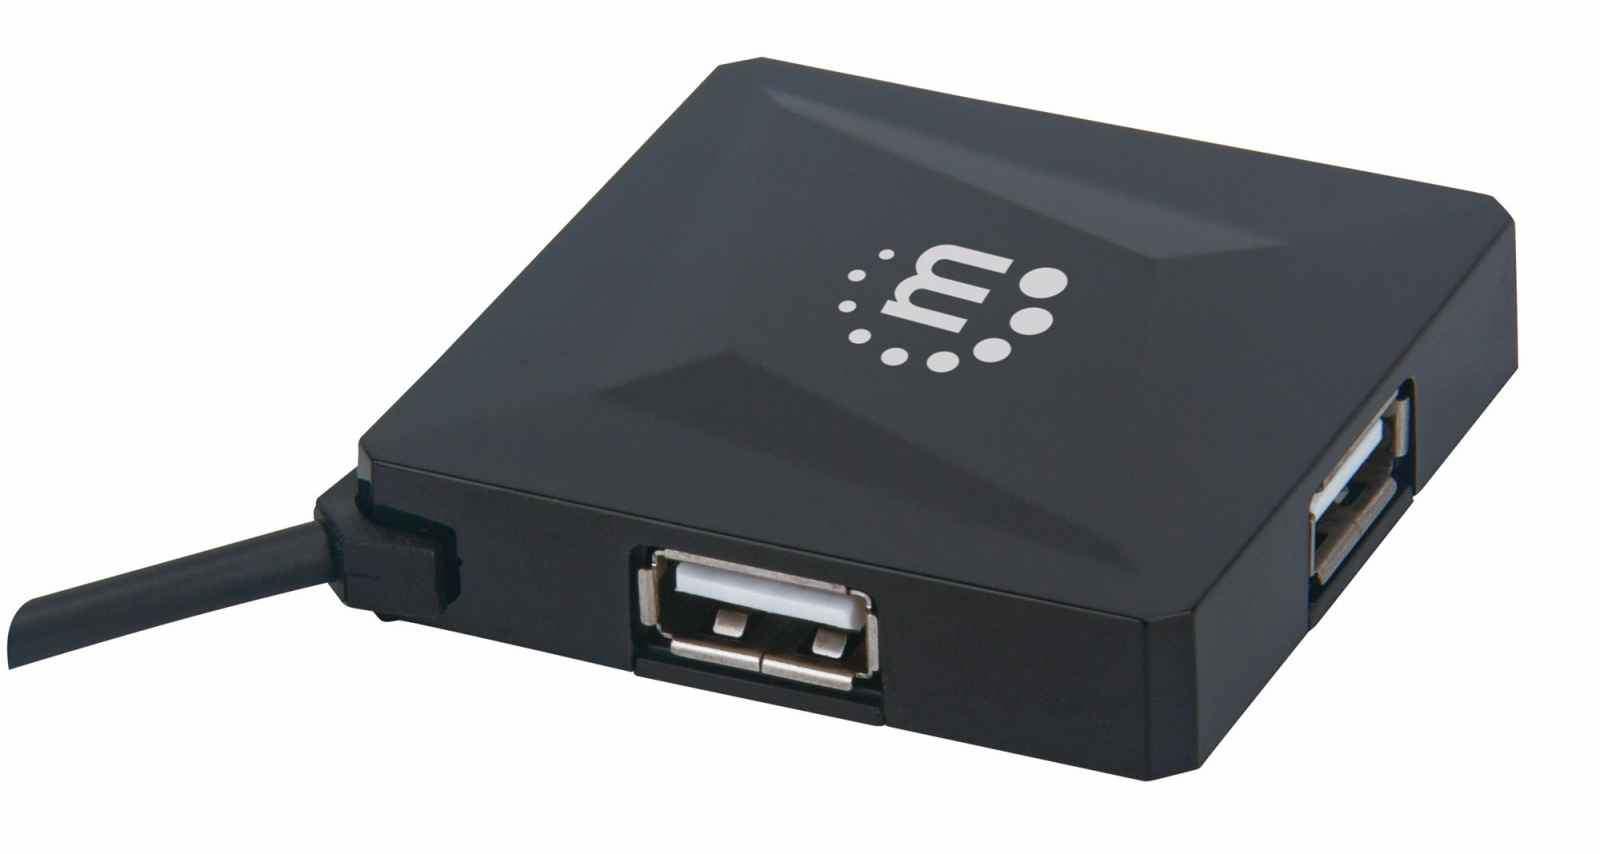 Manhattan 164818 - USB 2.0 - USB 2.0 - 480 Mbit/s - Schwarz - Kunststoff - 0,6 m